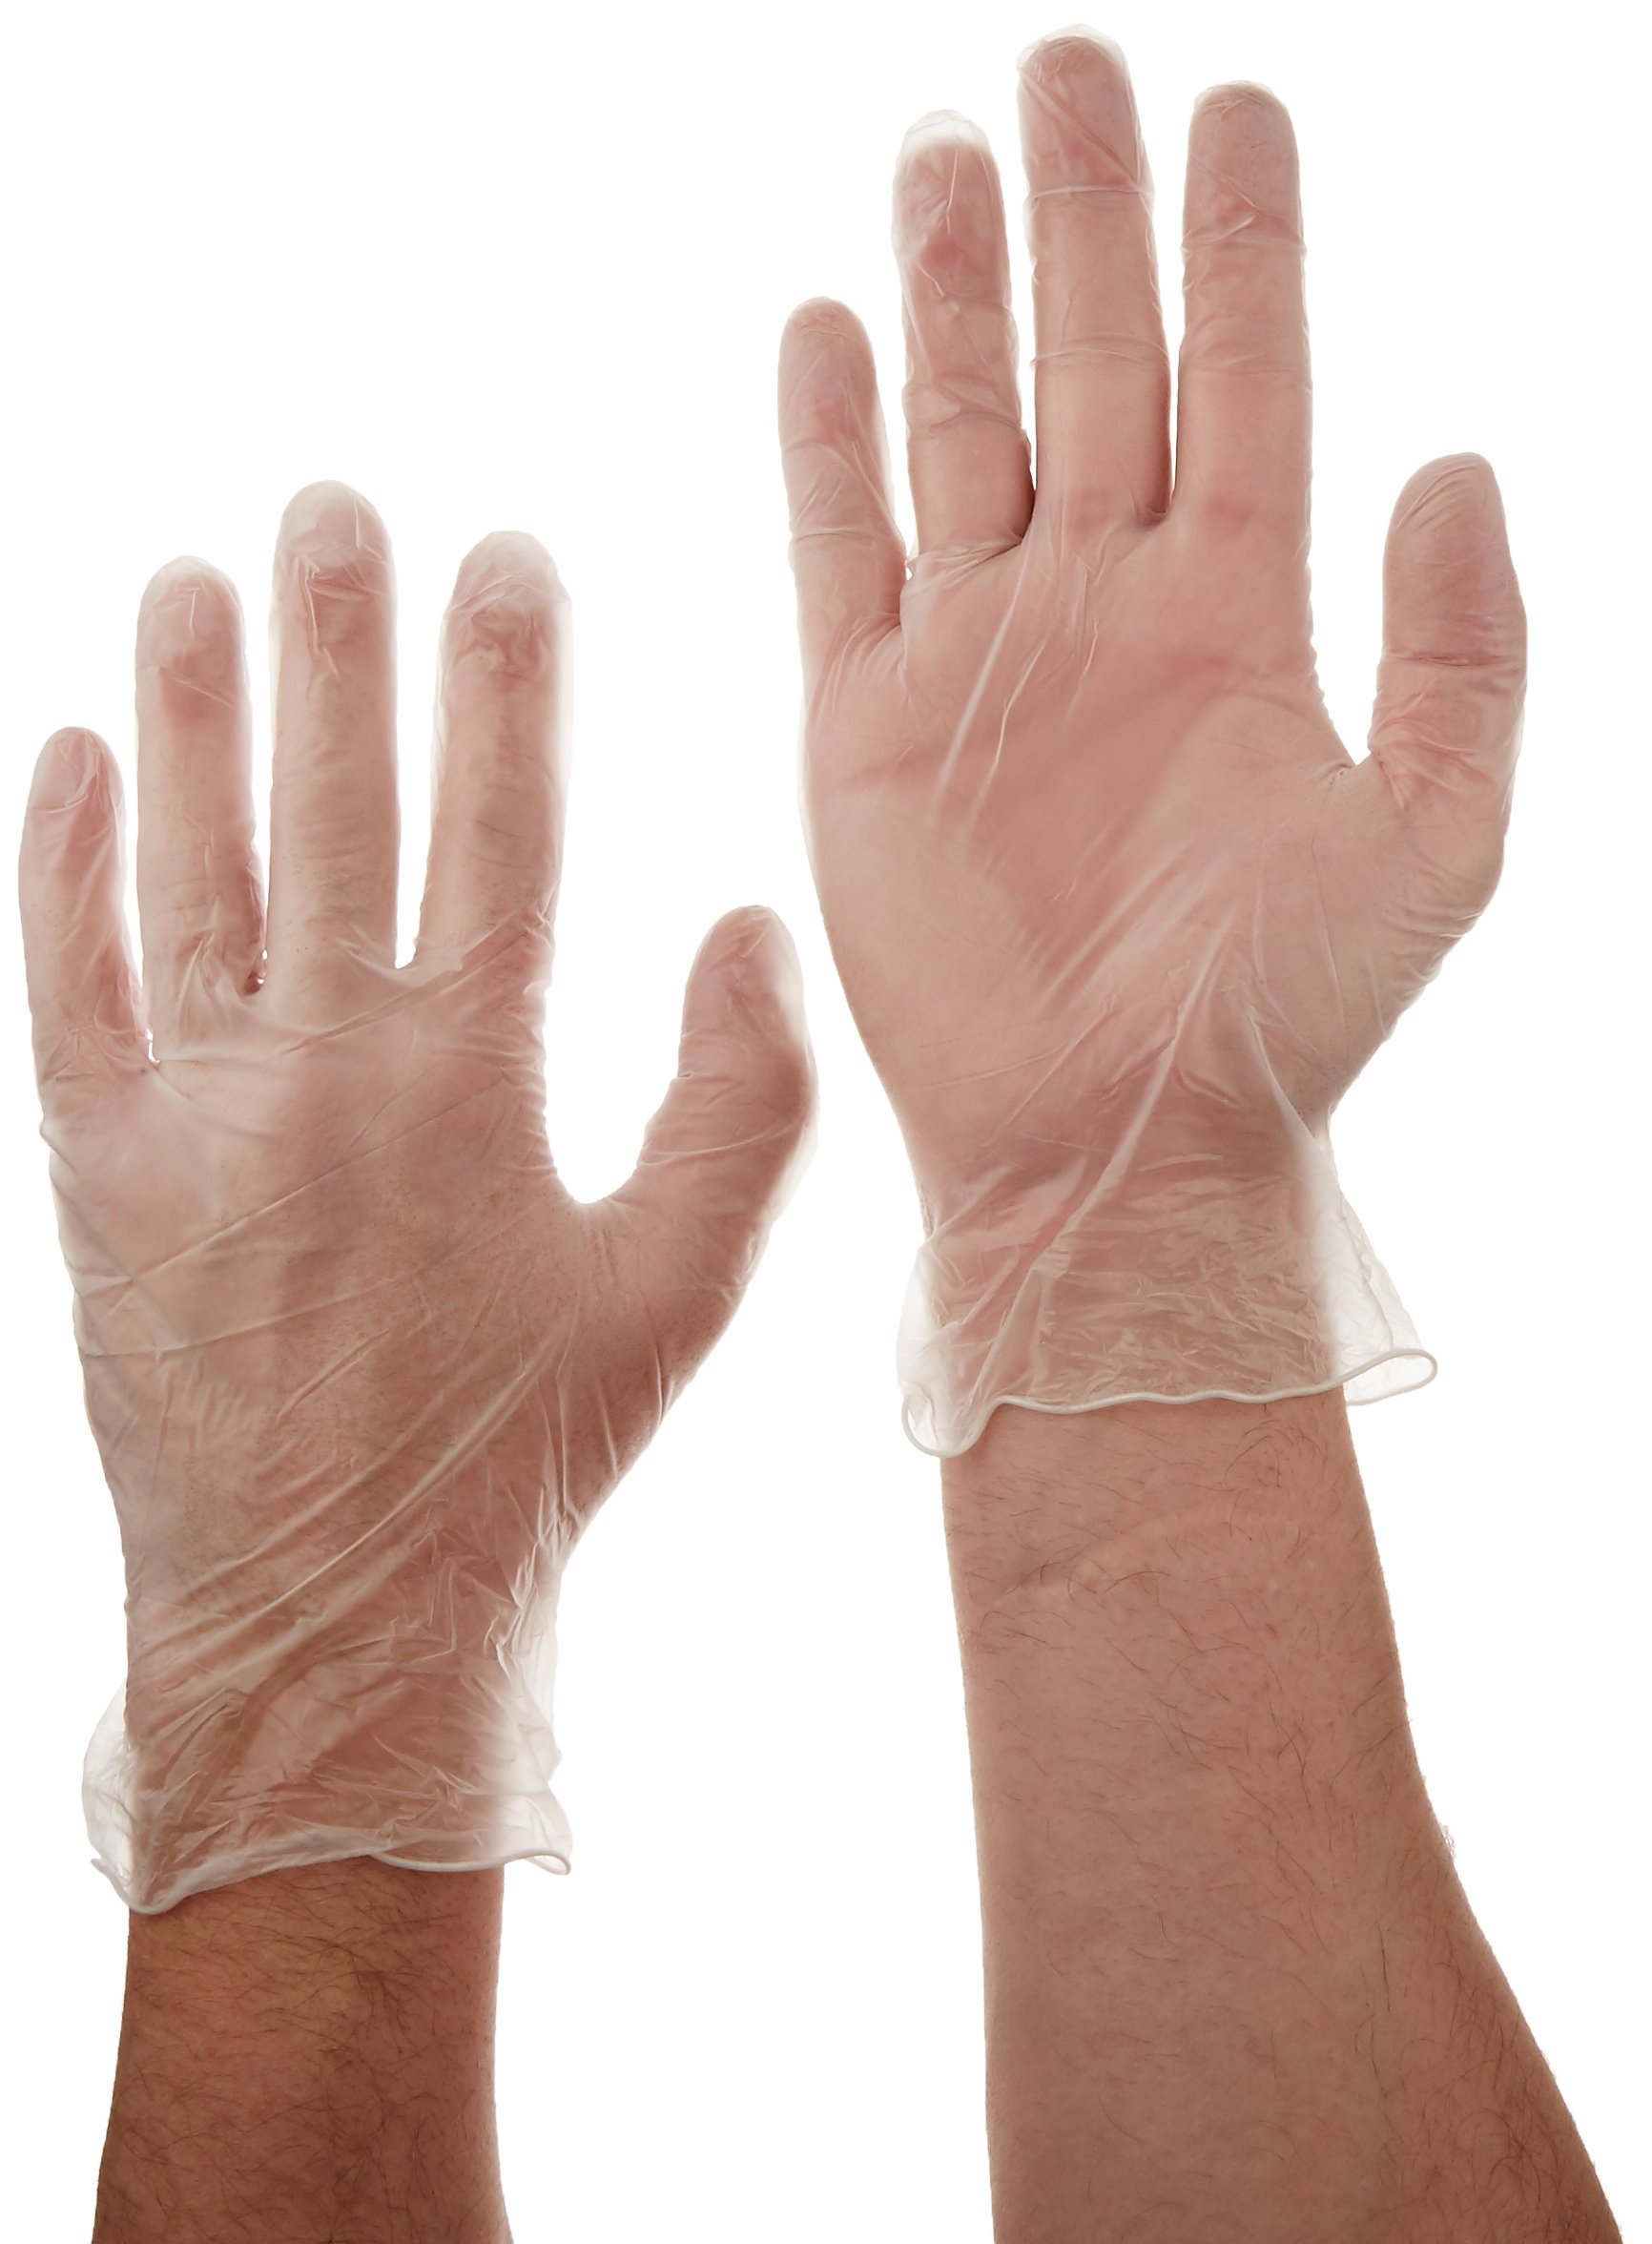 Tradex VLG5201 Ambitex Vinyl Powdered Free Multi-Purpose Gloves, Large, Clear (Pack of 1000)